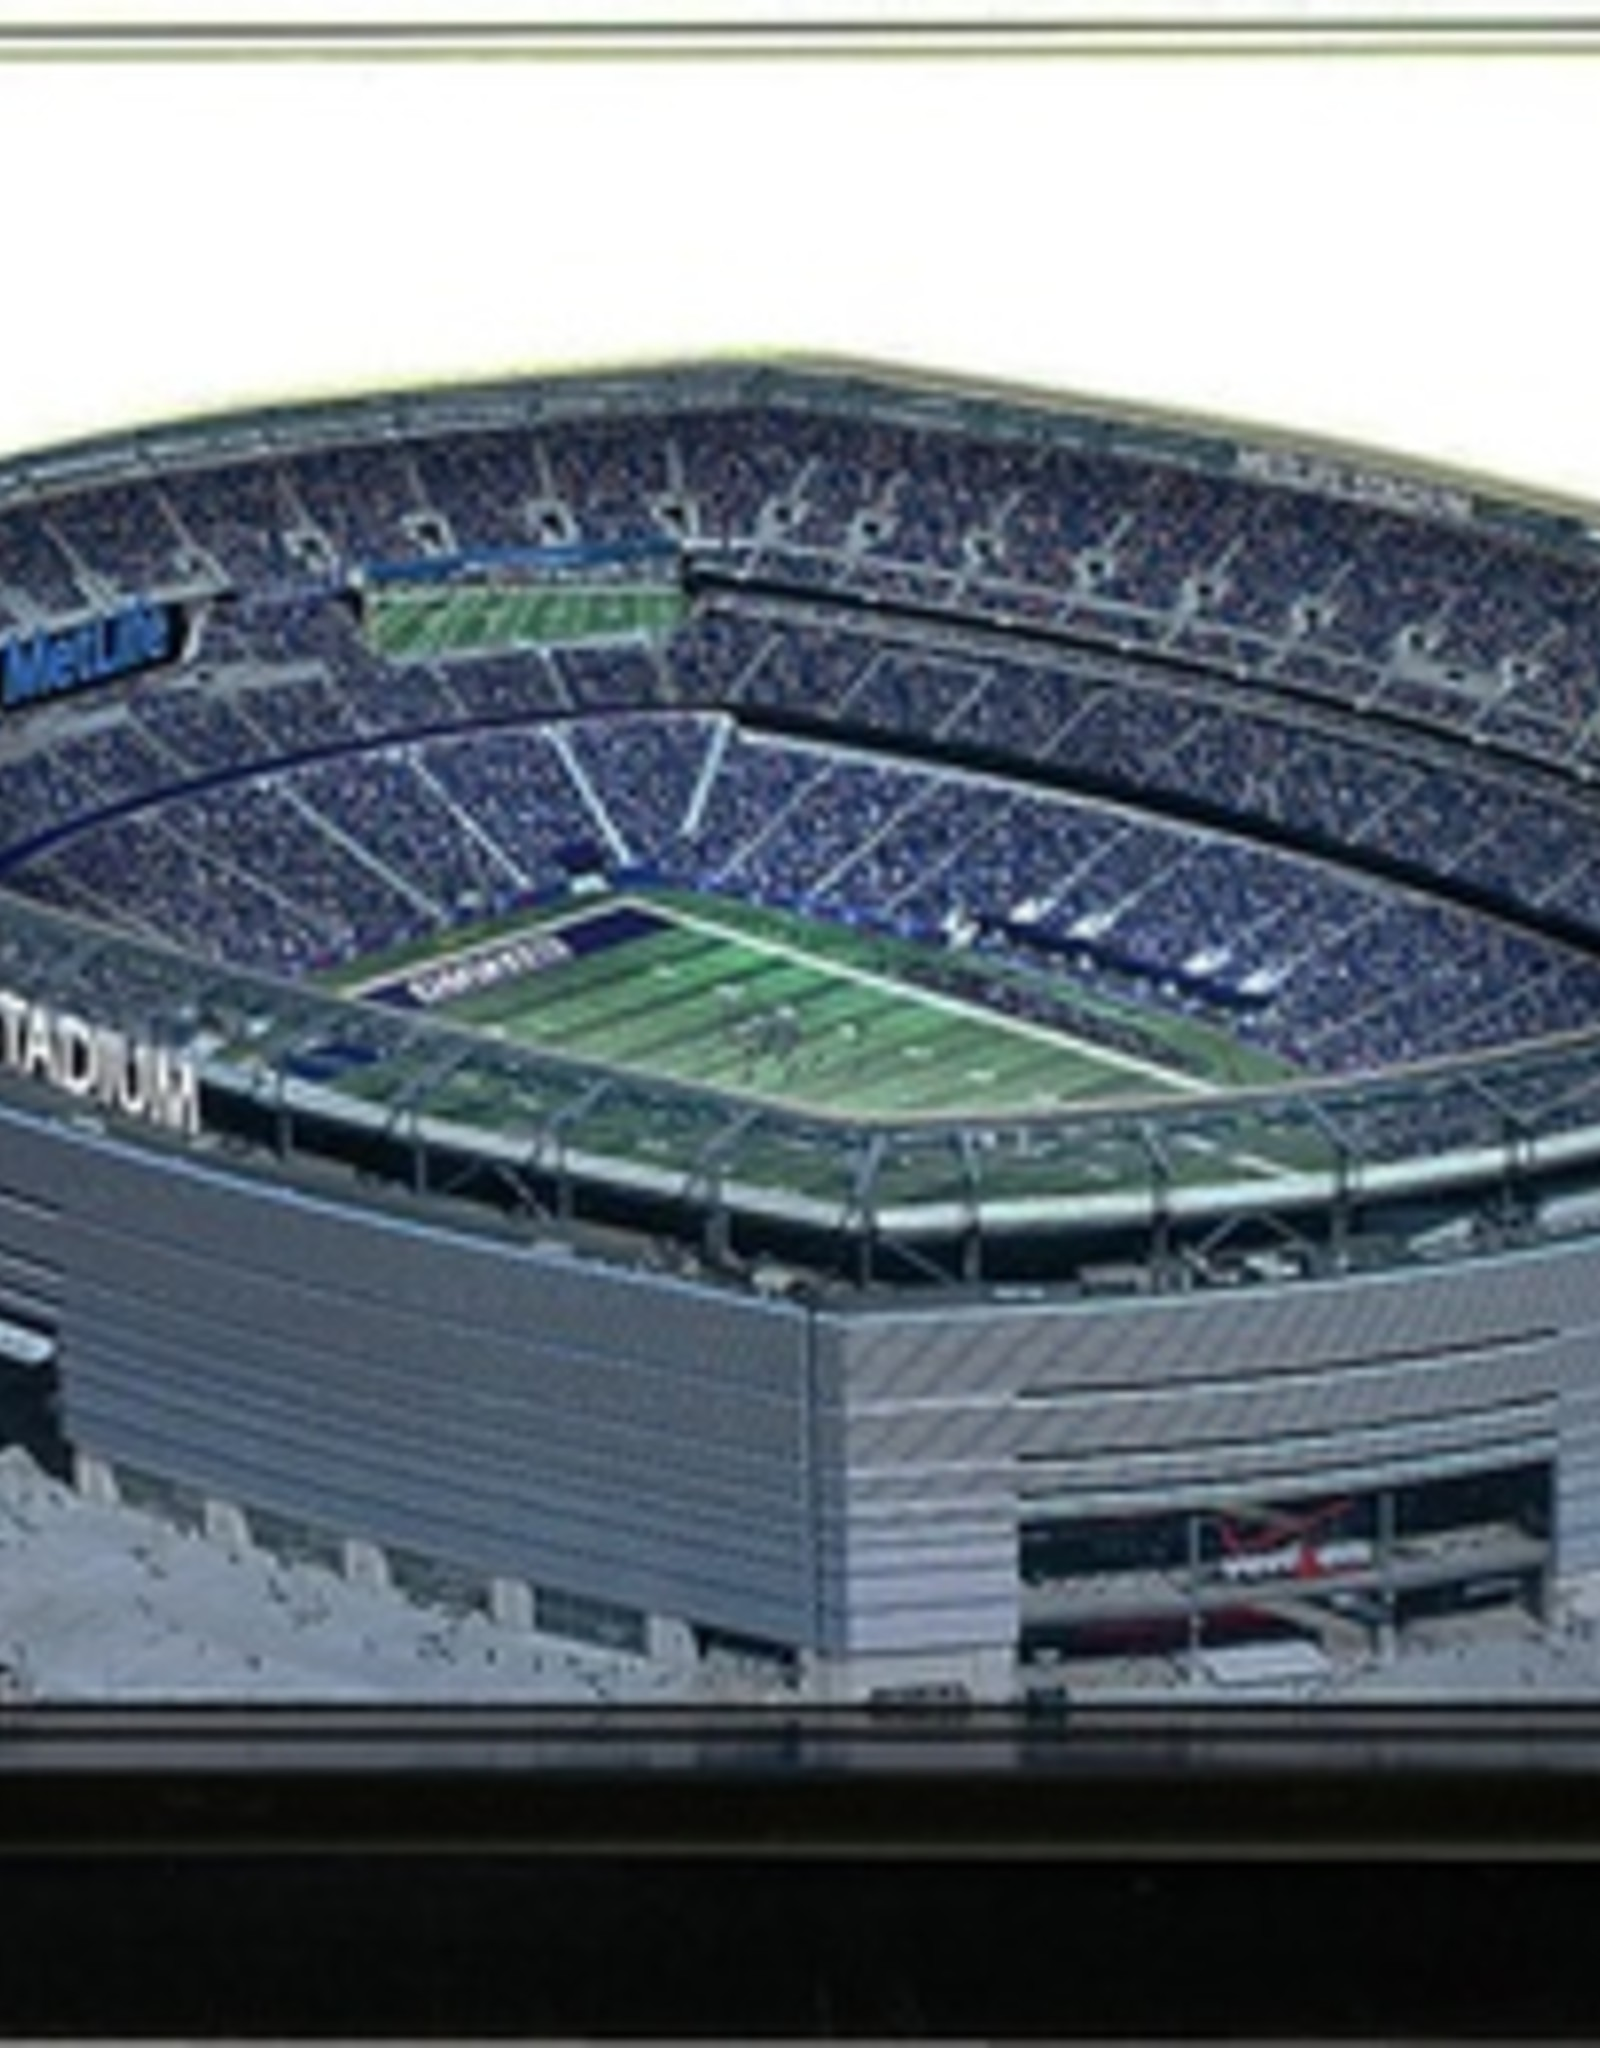 HOMEFIELDS New York Giants 19IN Lighted Replica Metlife Stadium